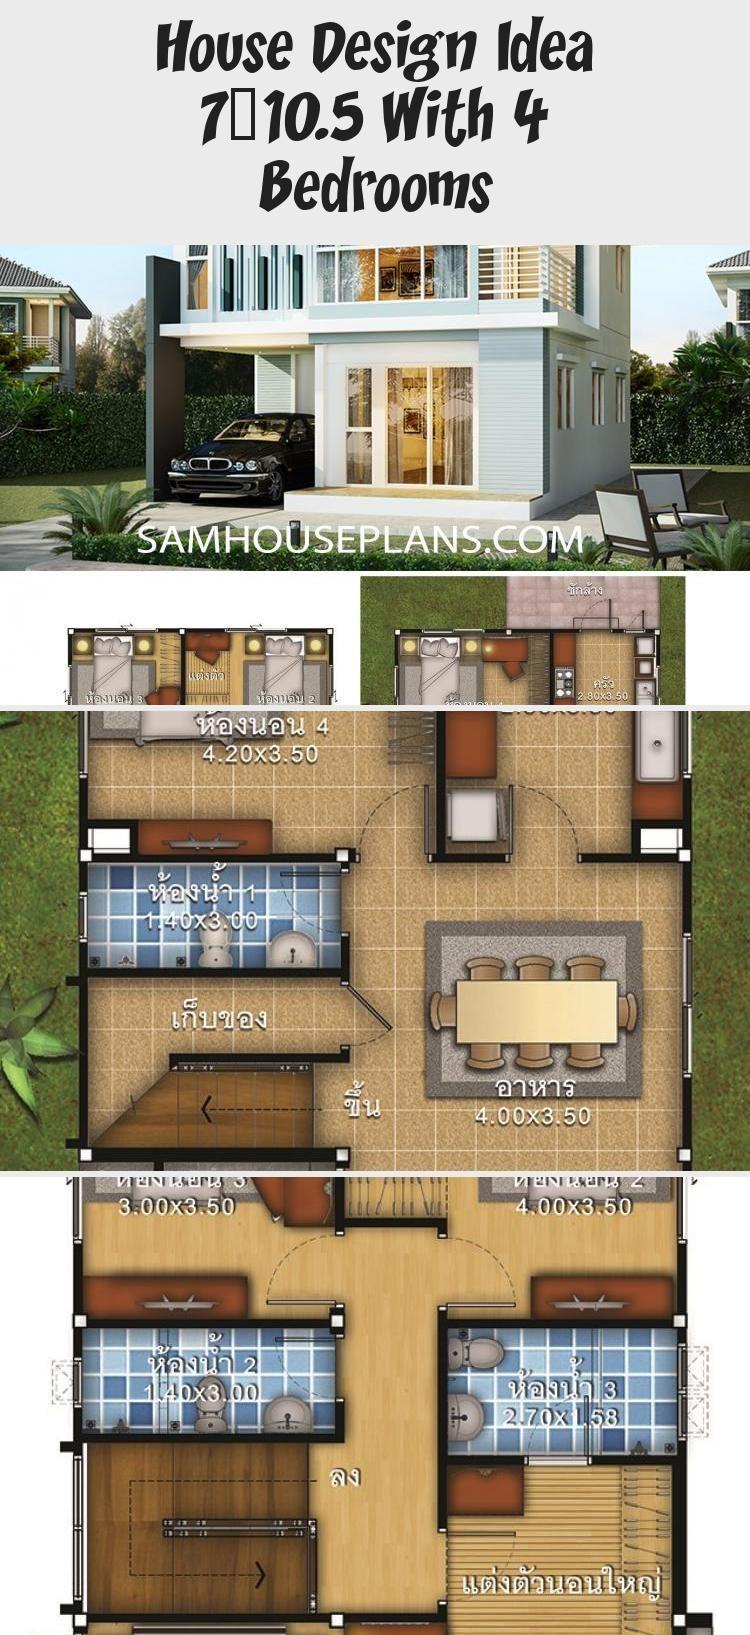 House Design Idea 7x10 5 With 4 Bedrooms Sam House Plans Smallhouseplansinterior Smallhouseplanswithsunroom In 2020 Pool House Plans Small House Plans House Design